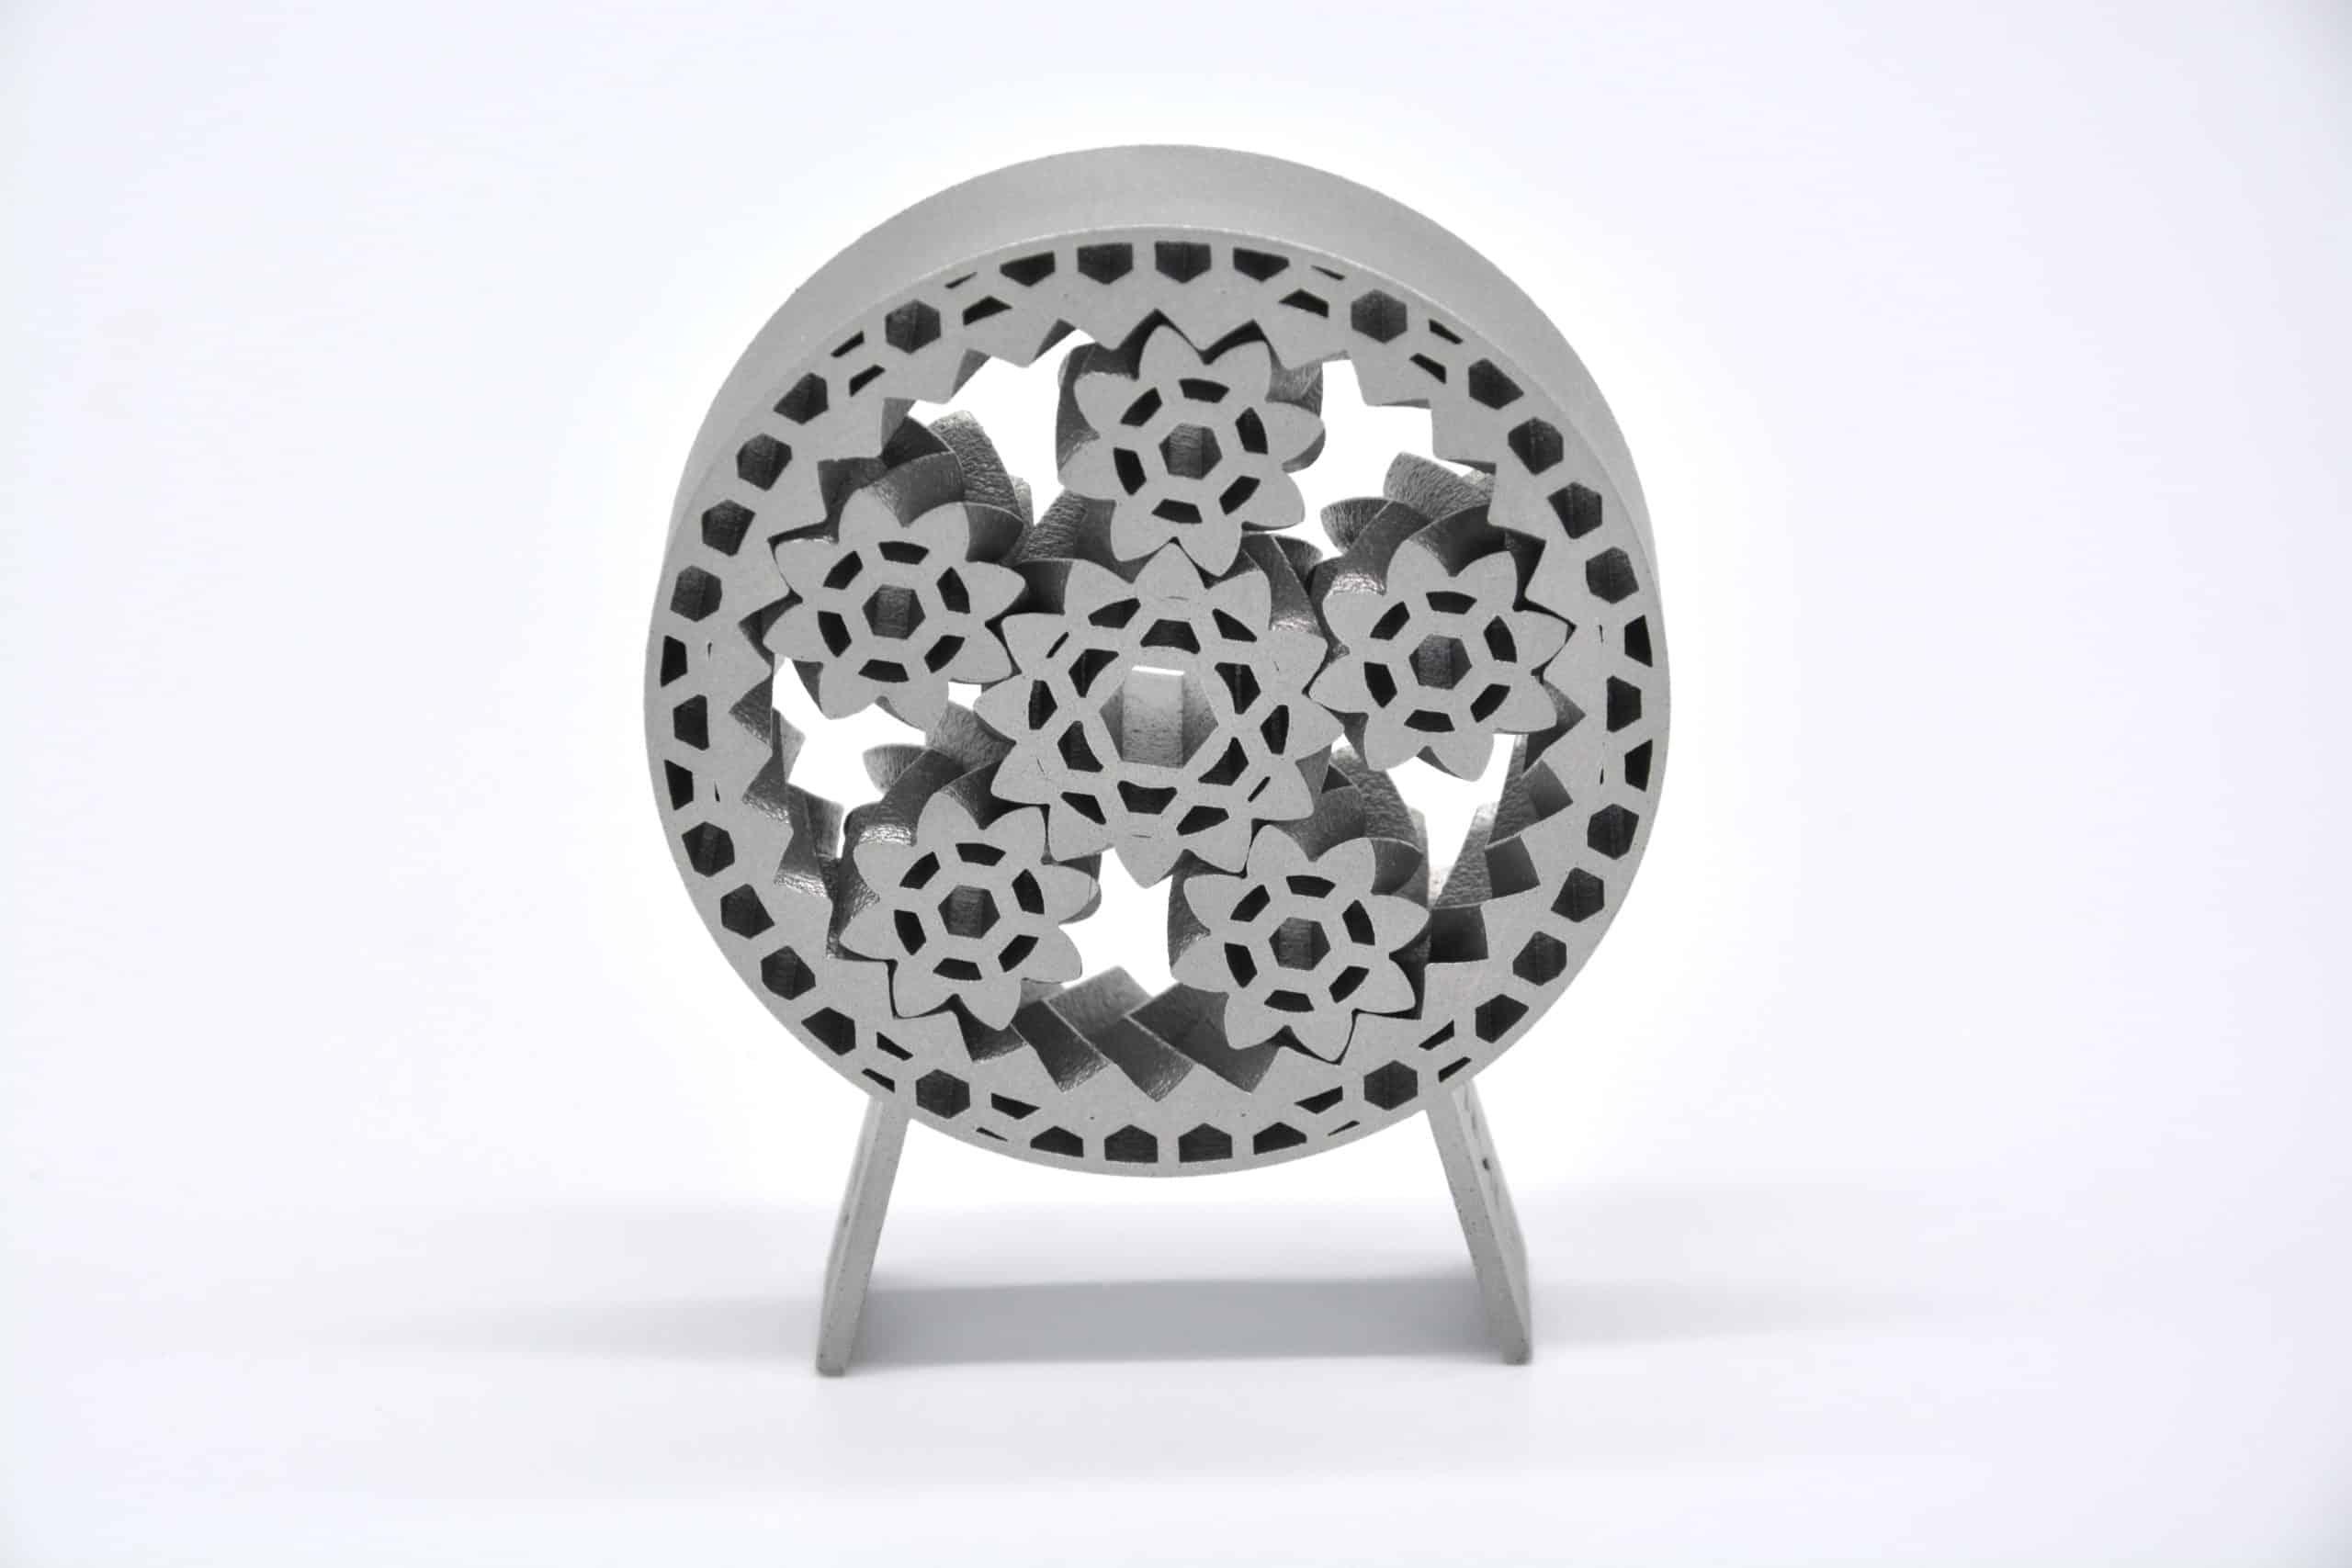 DMLS 3D printed aluminium part